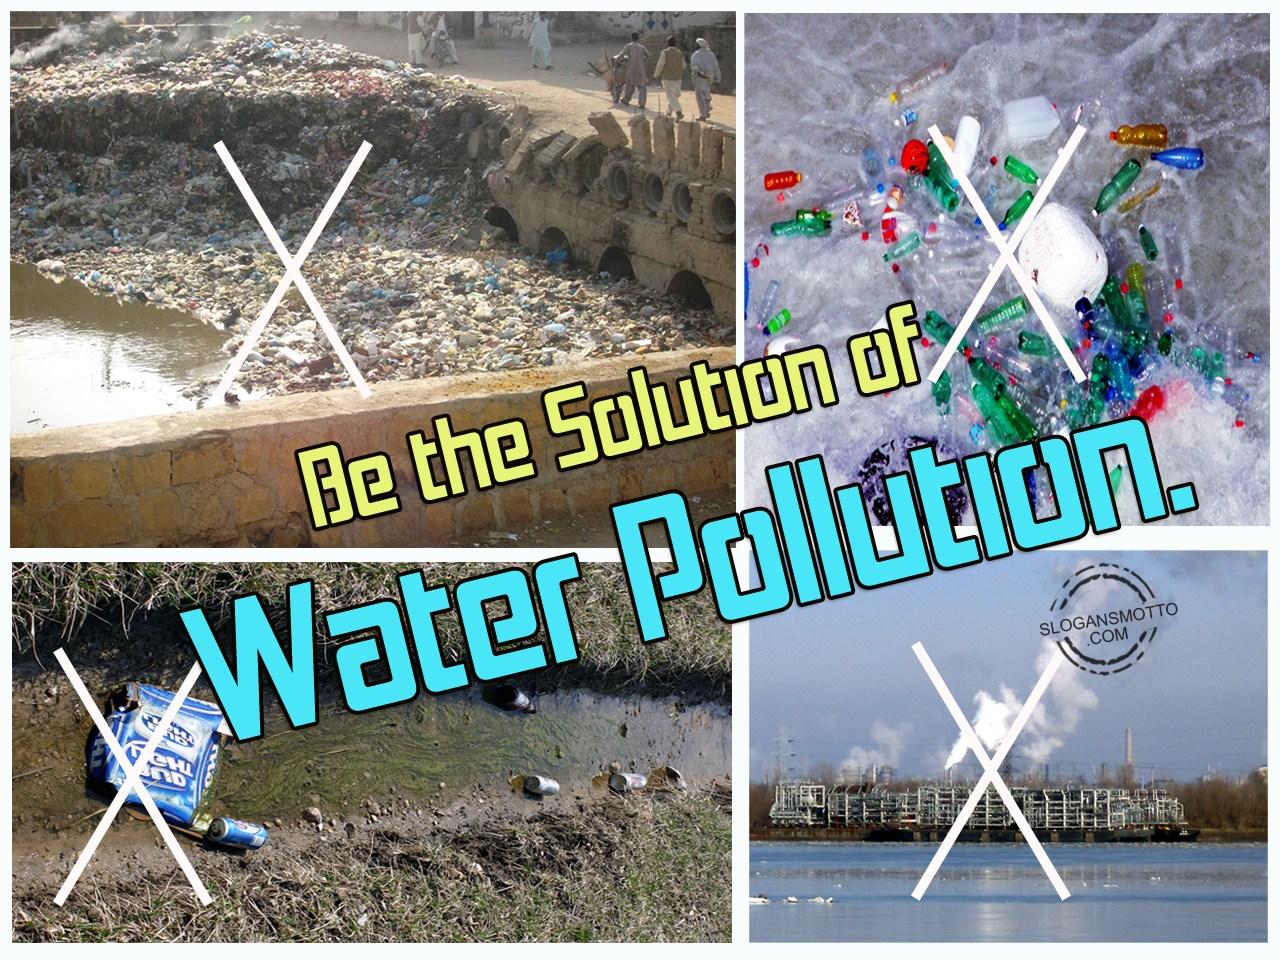 slogans in water pollution Pollution slogans (प्रदूषण घोषवाक्य) in marathi  this slogan was submitted by kadamkl  water slogans (पाणी .